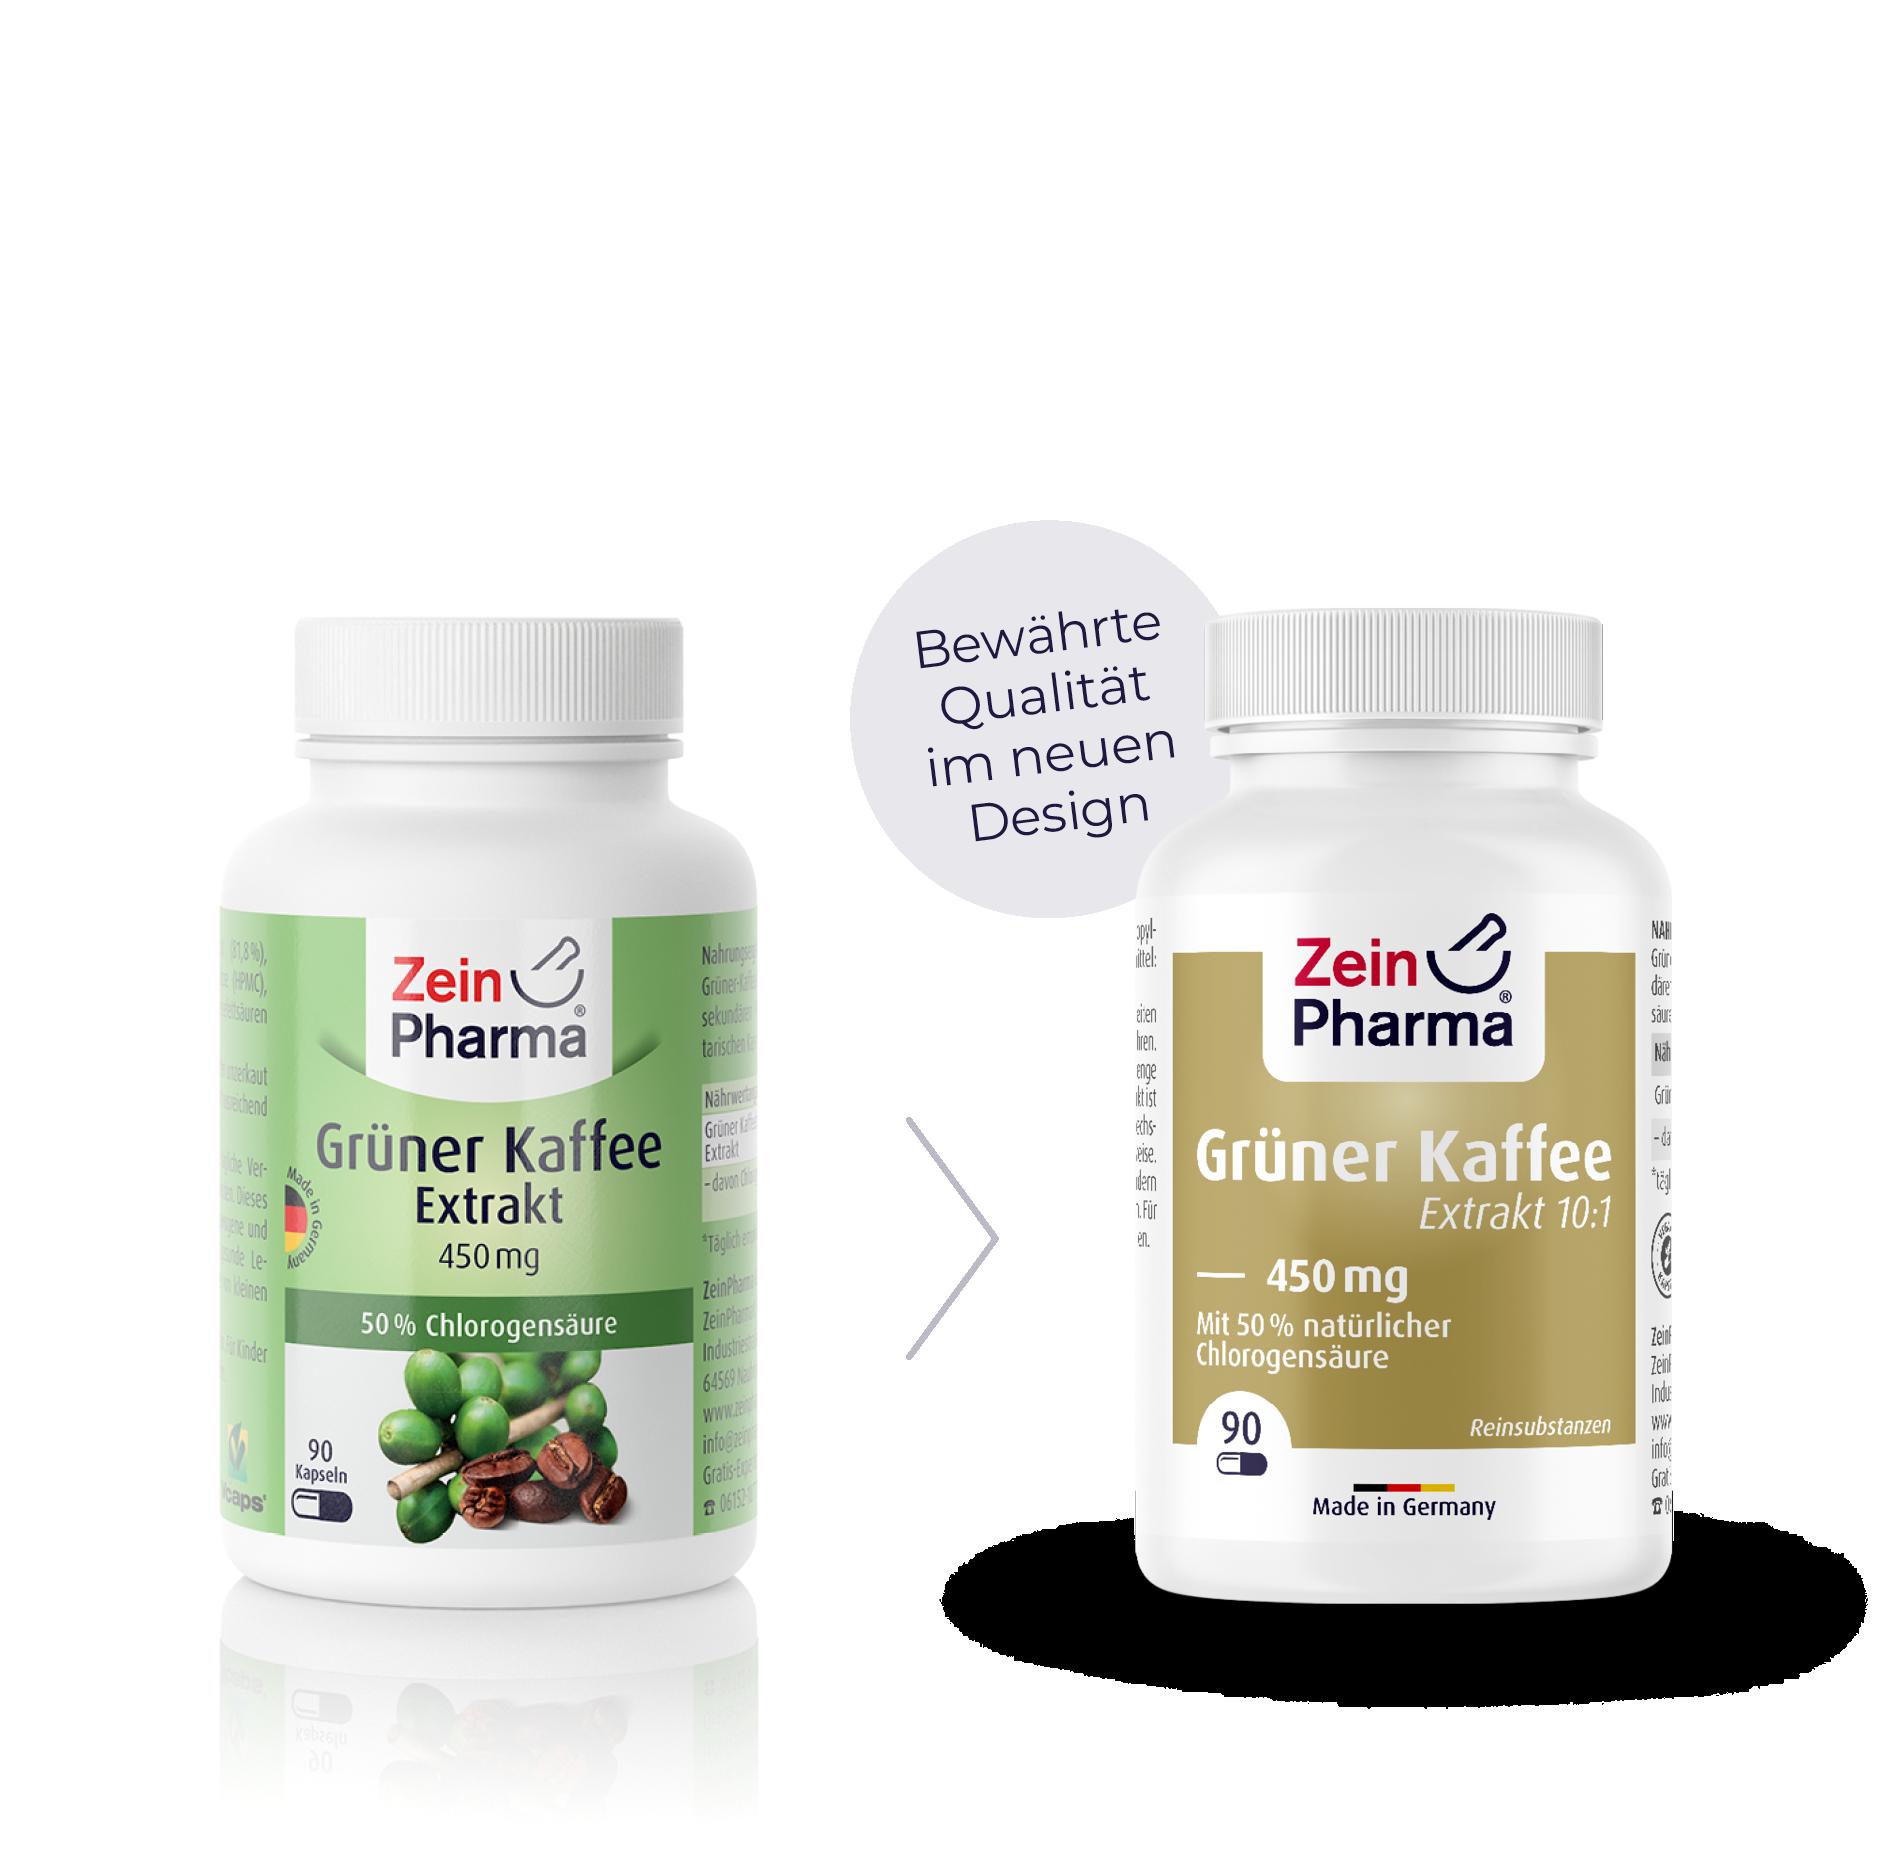 Grüner Kaffee Extrakt Kapseln